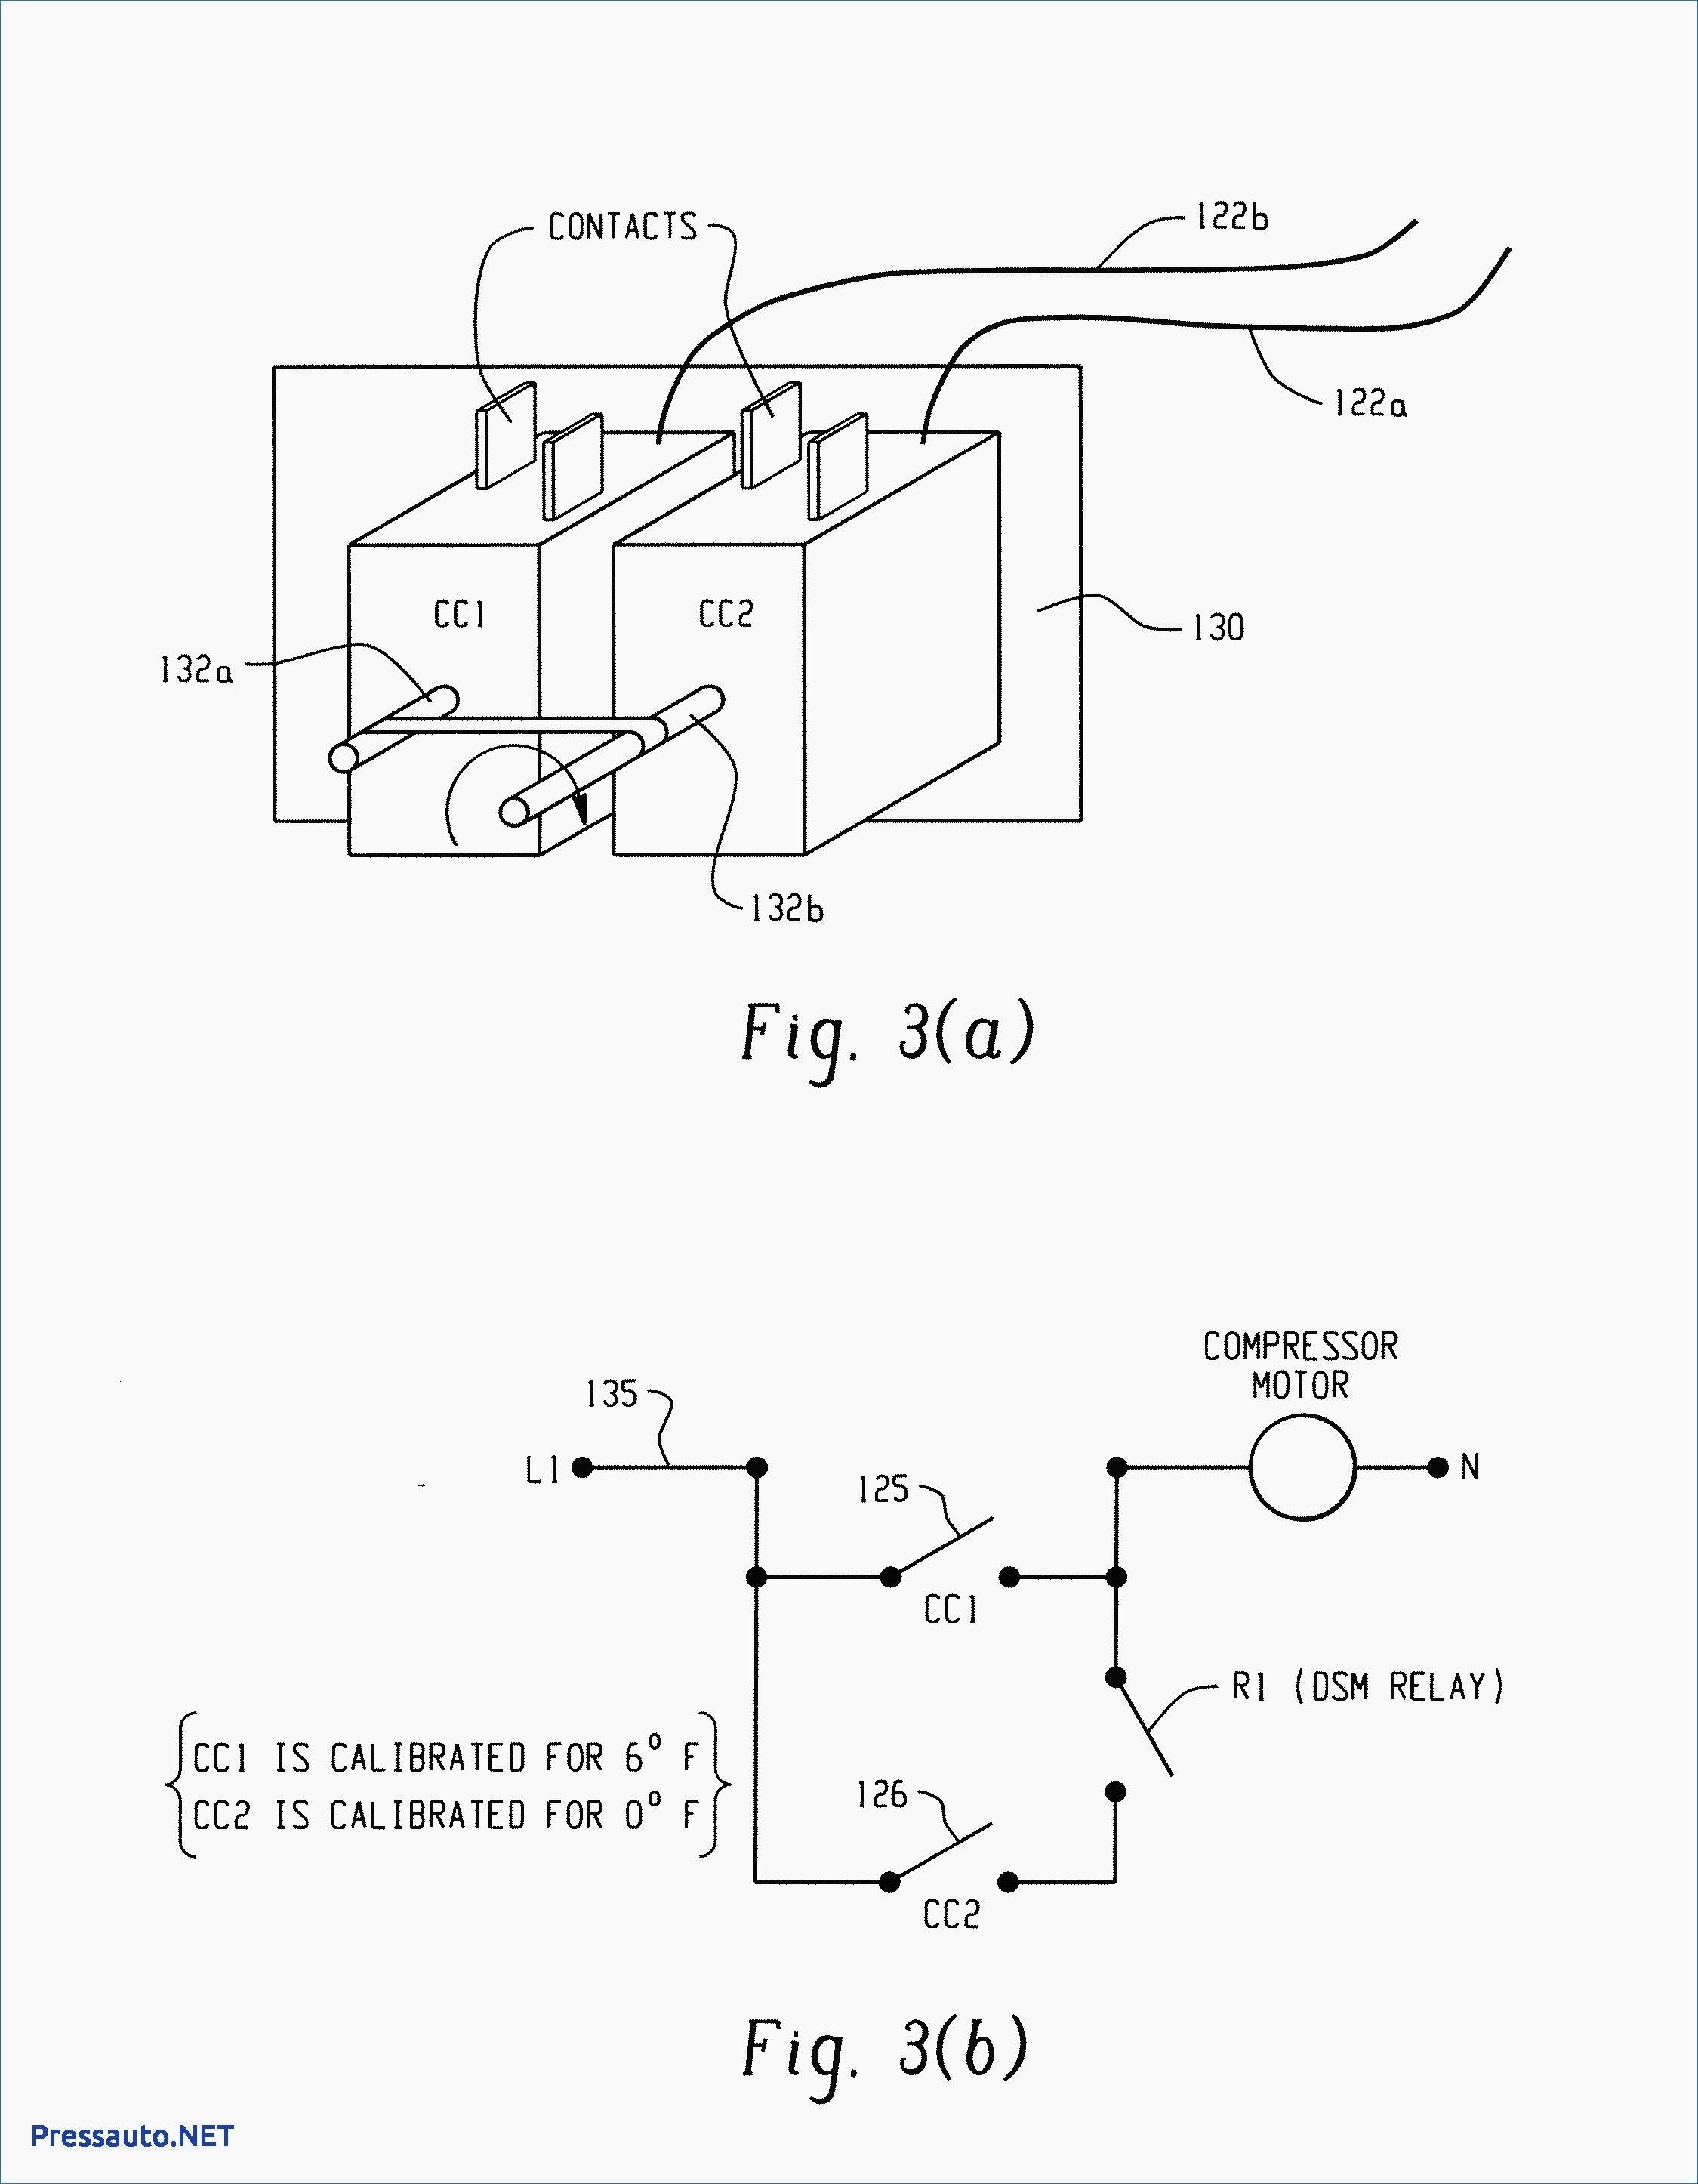 3 wire pressure transducer wiring diagram free wiring diagram 120V Rocker Switch Electrical Wiring Diagrams 3 wire pressure transducer wiring diagram 3 wire pressure transducer wiring diagram luxury series 2